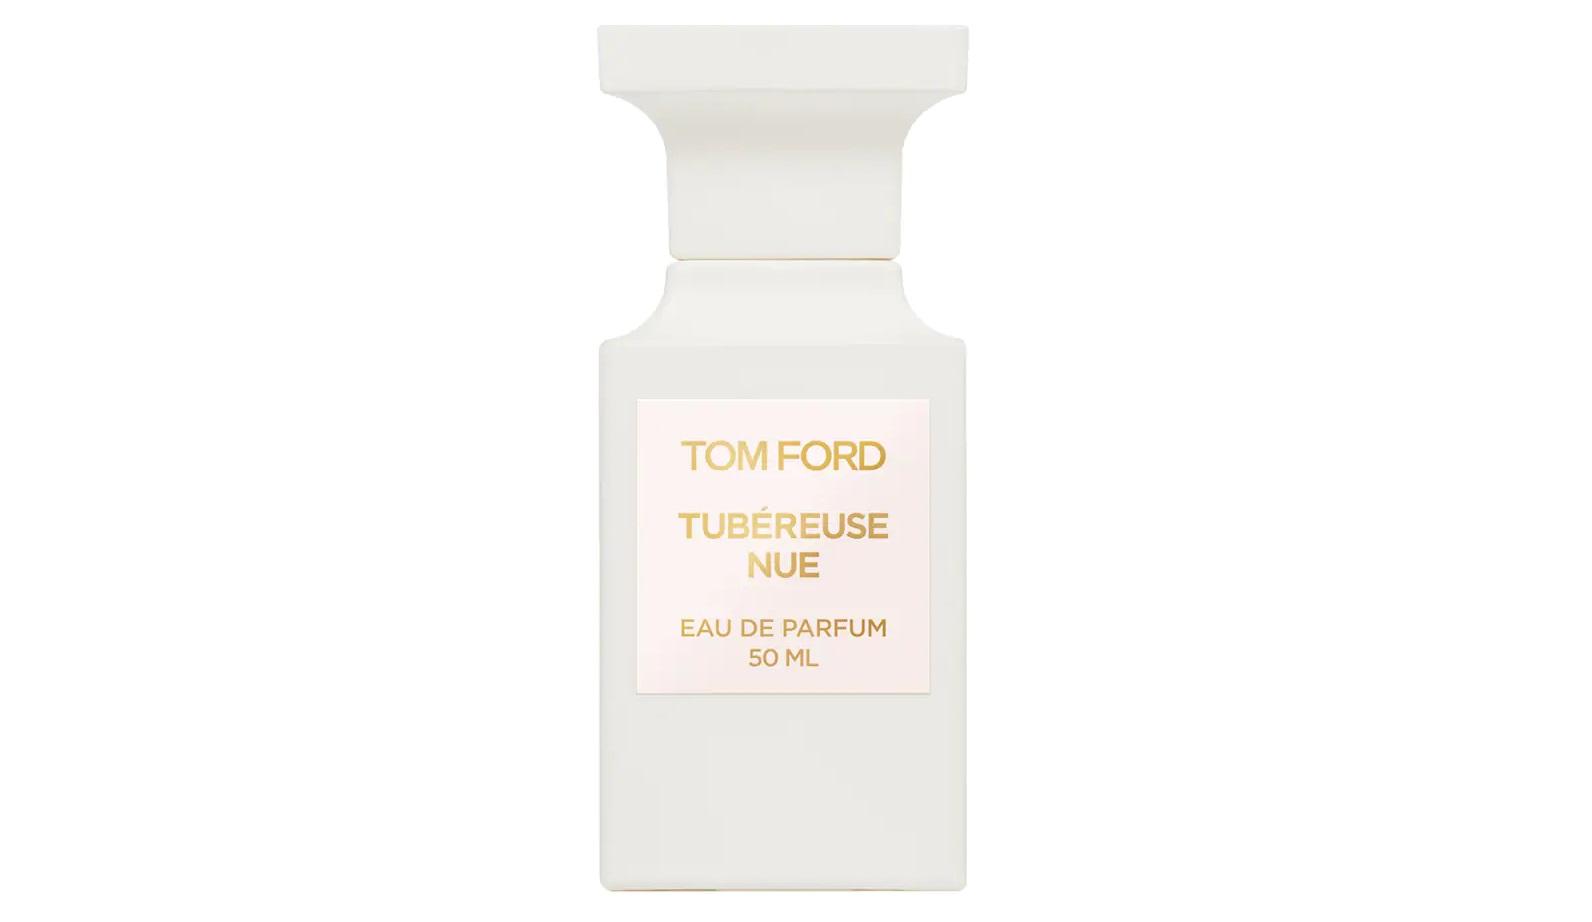 Tom Ford Tubereuse Nue 50 mL